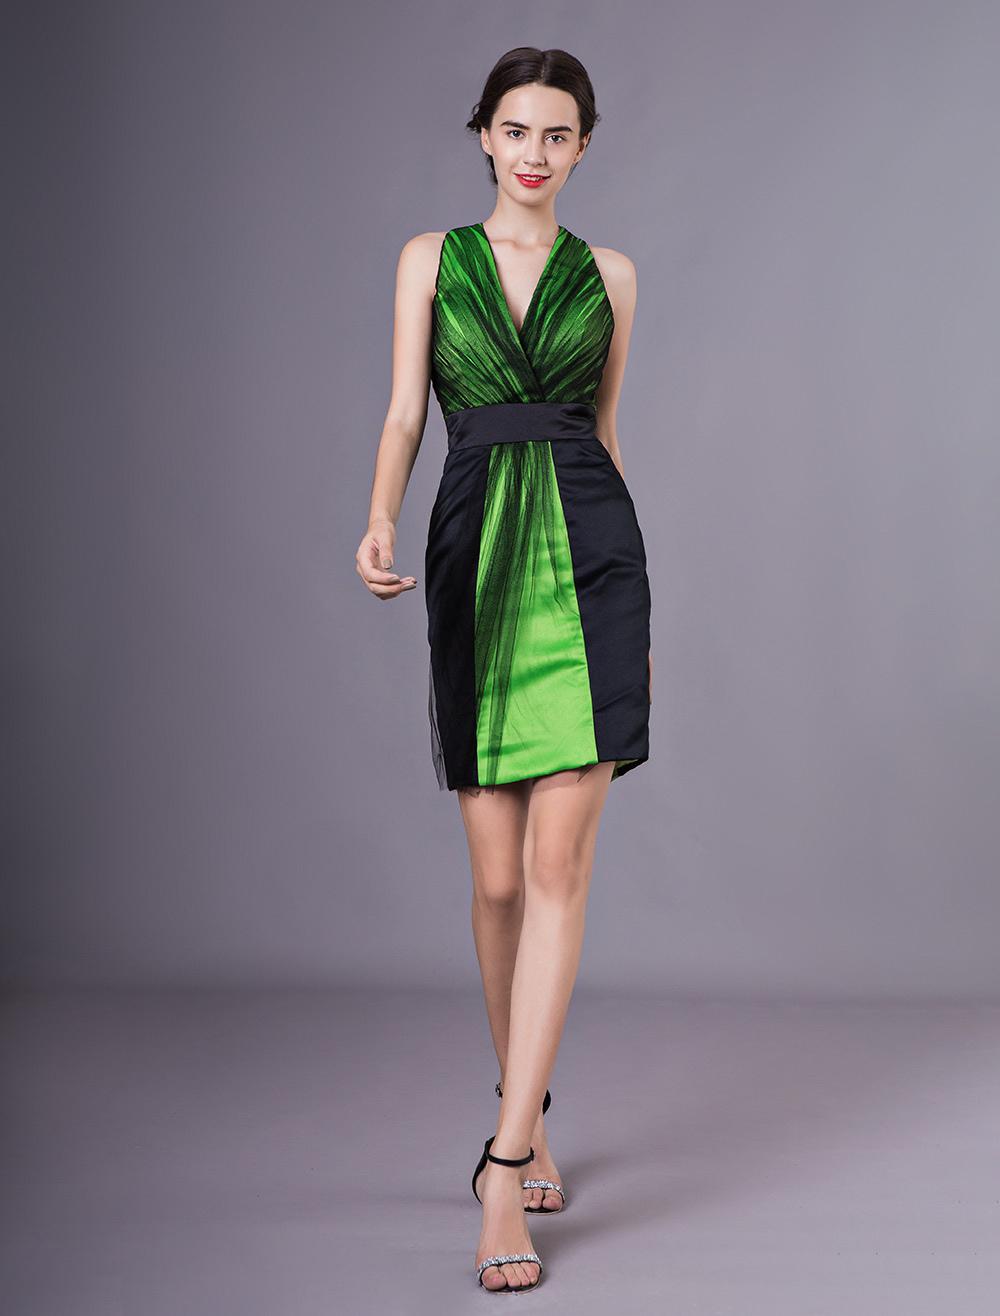 628cda5530a63 Gorgeous Black Sheath V-Neck Pleated Sleeveless Tulle Cocktail Dress  Wedding Guest Dress Milanoo